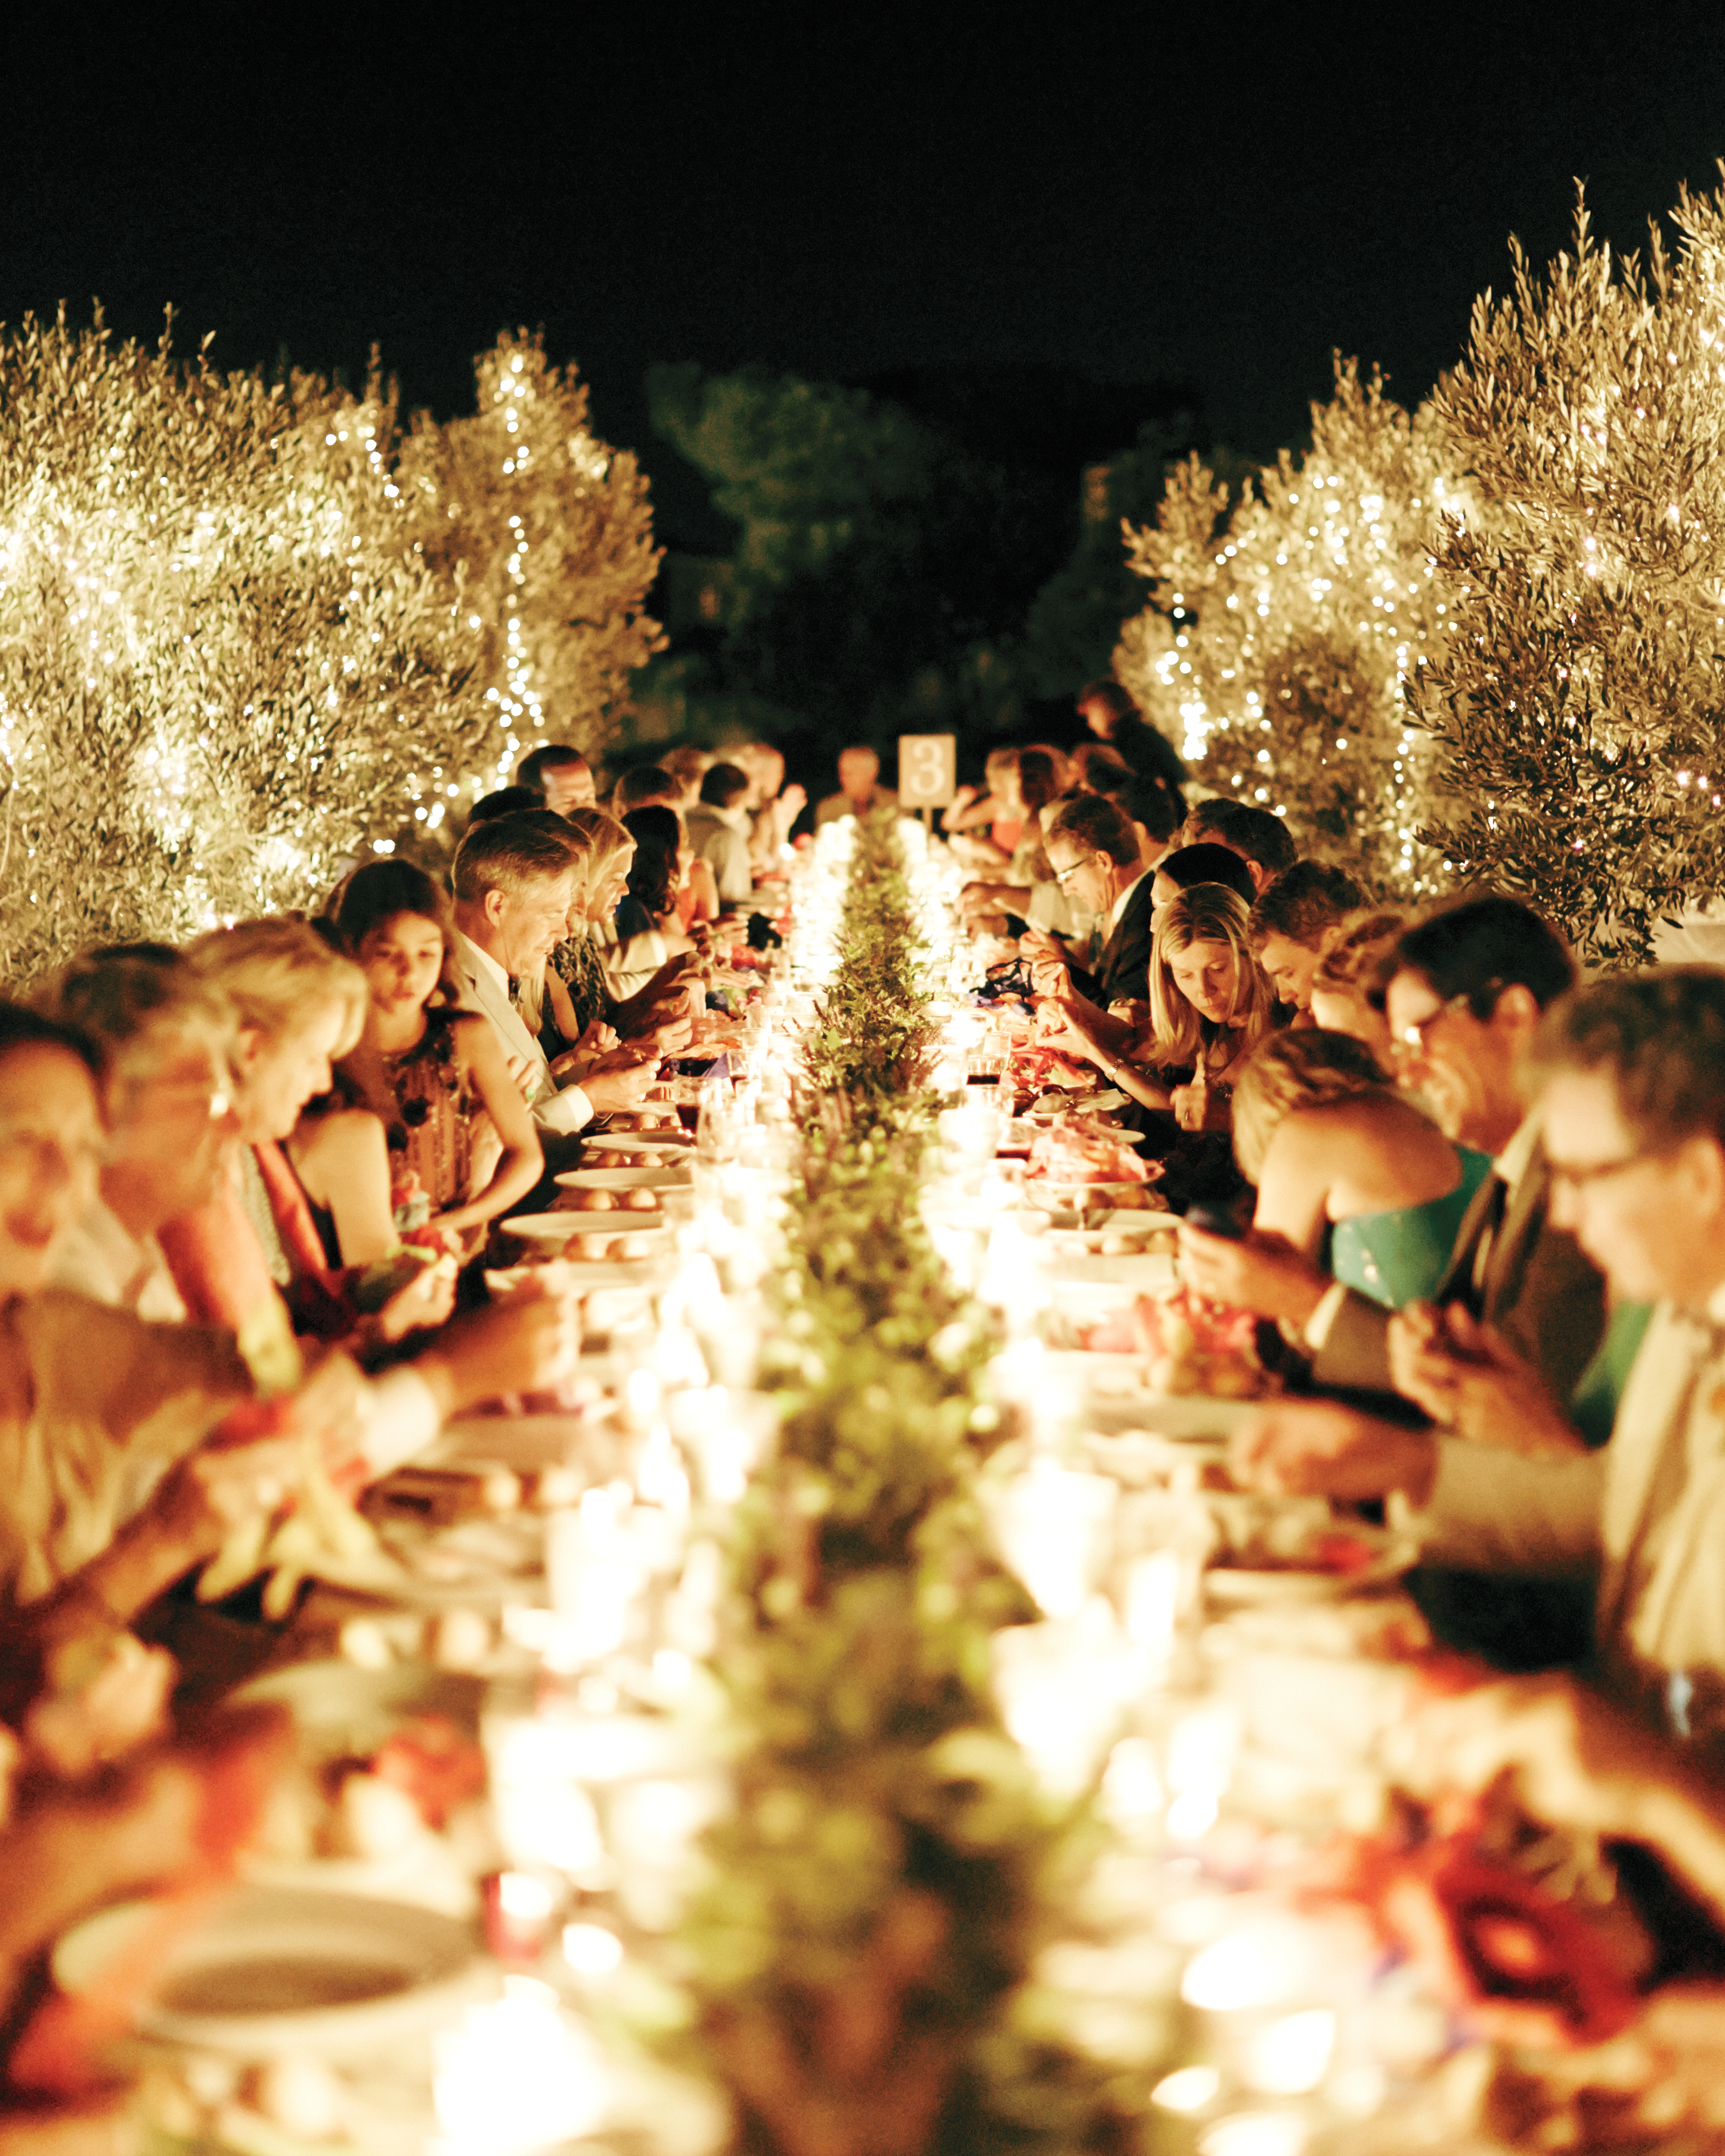 ana-alden-wedding-greece-611a5385-s111821.jpg